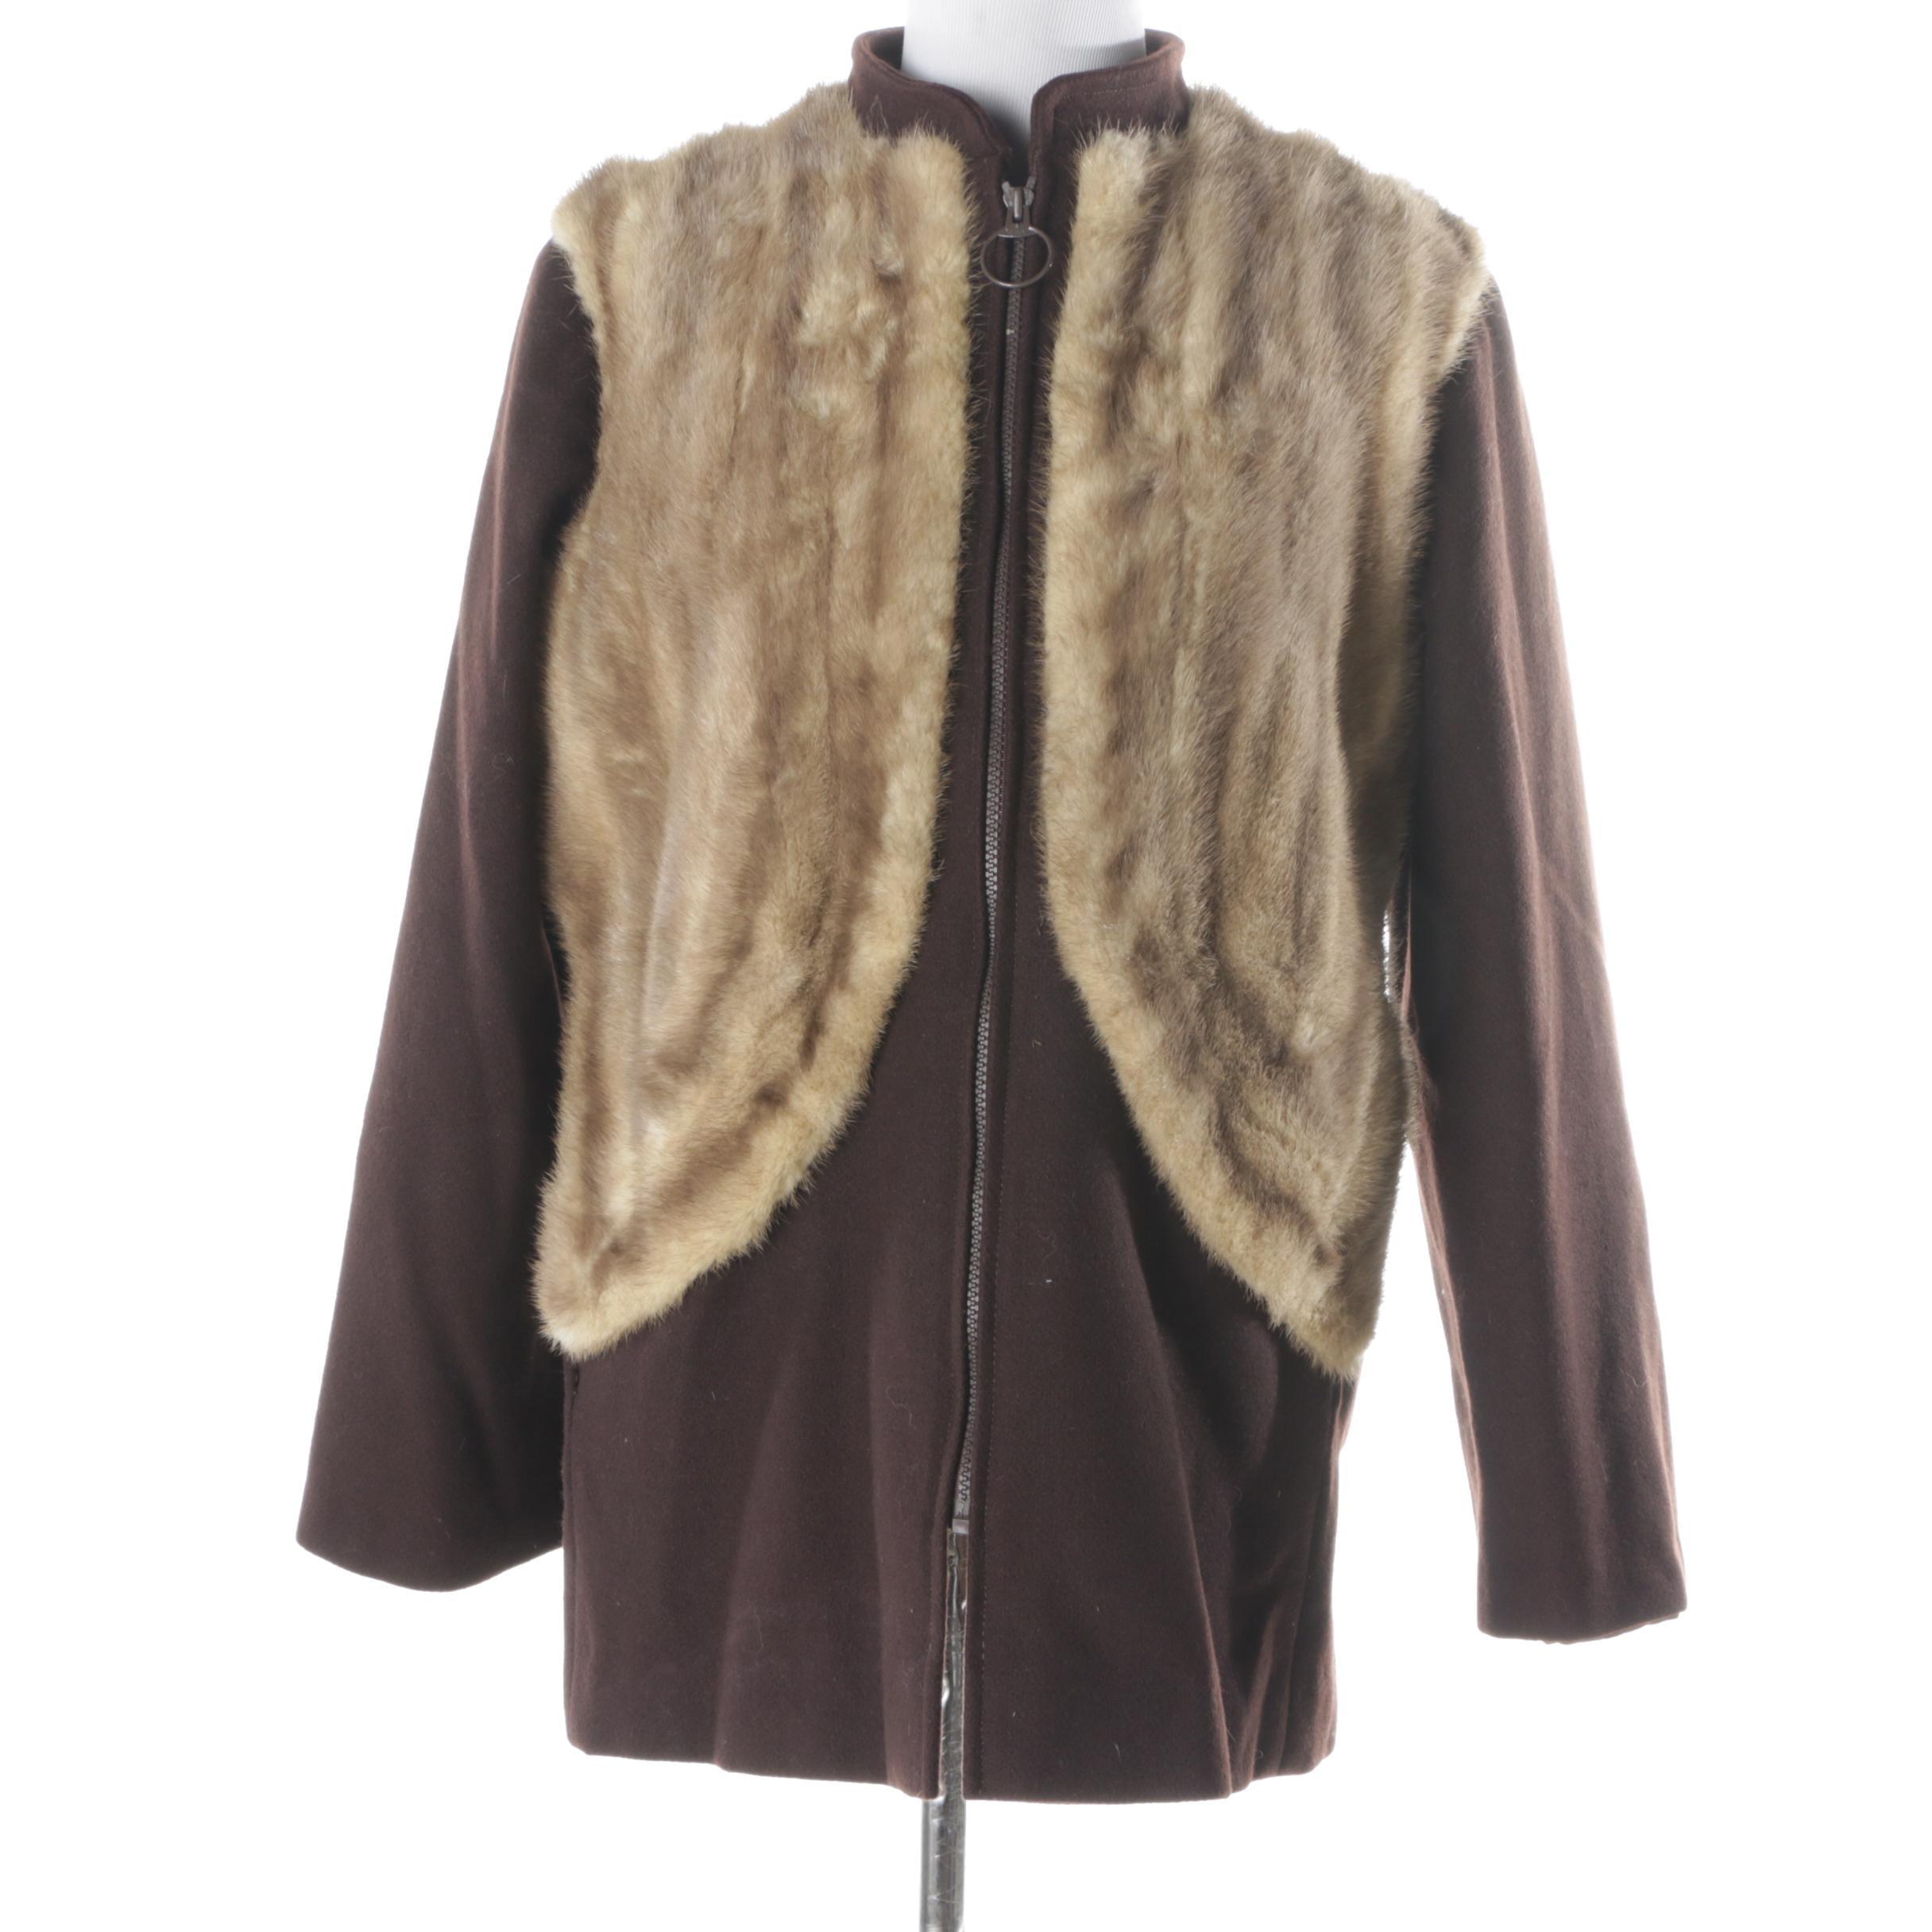 Wool and Mink Fur Jacket